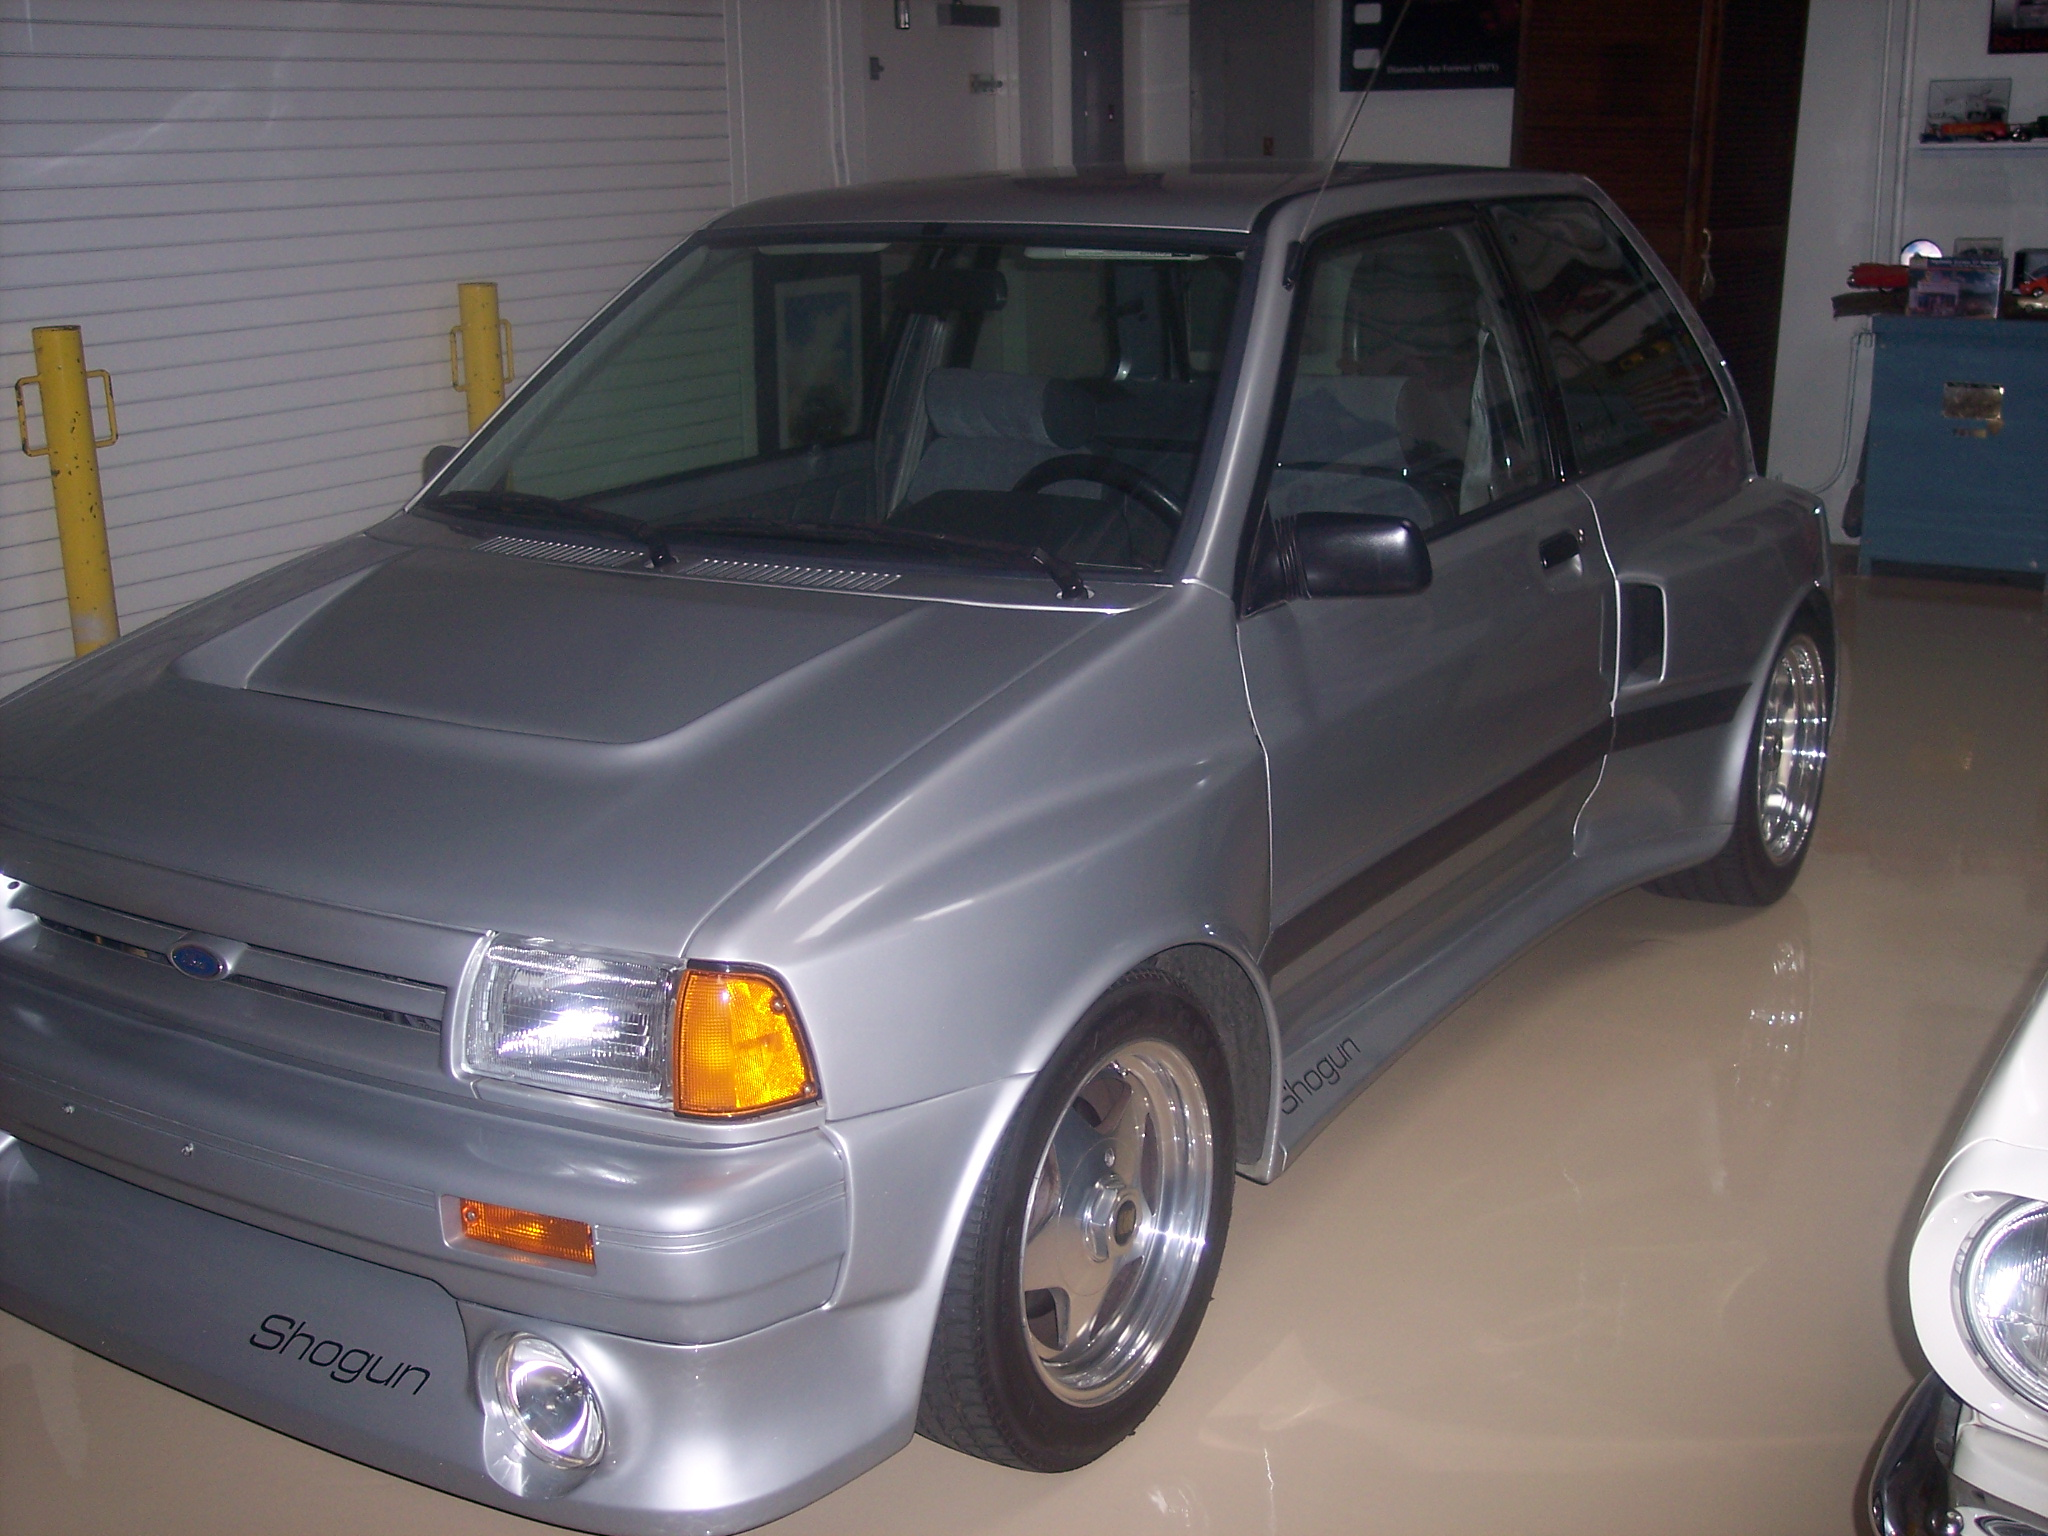 60HP Fiesta